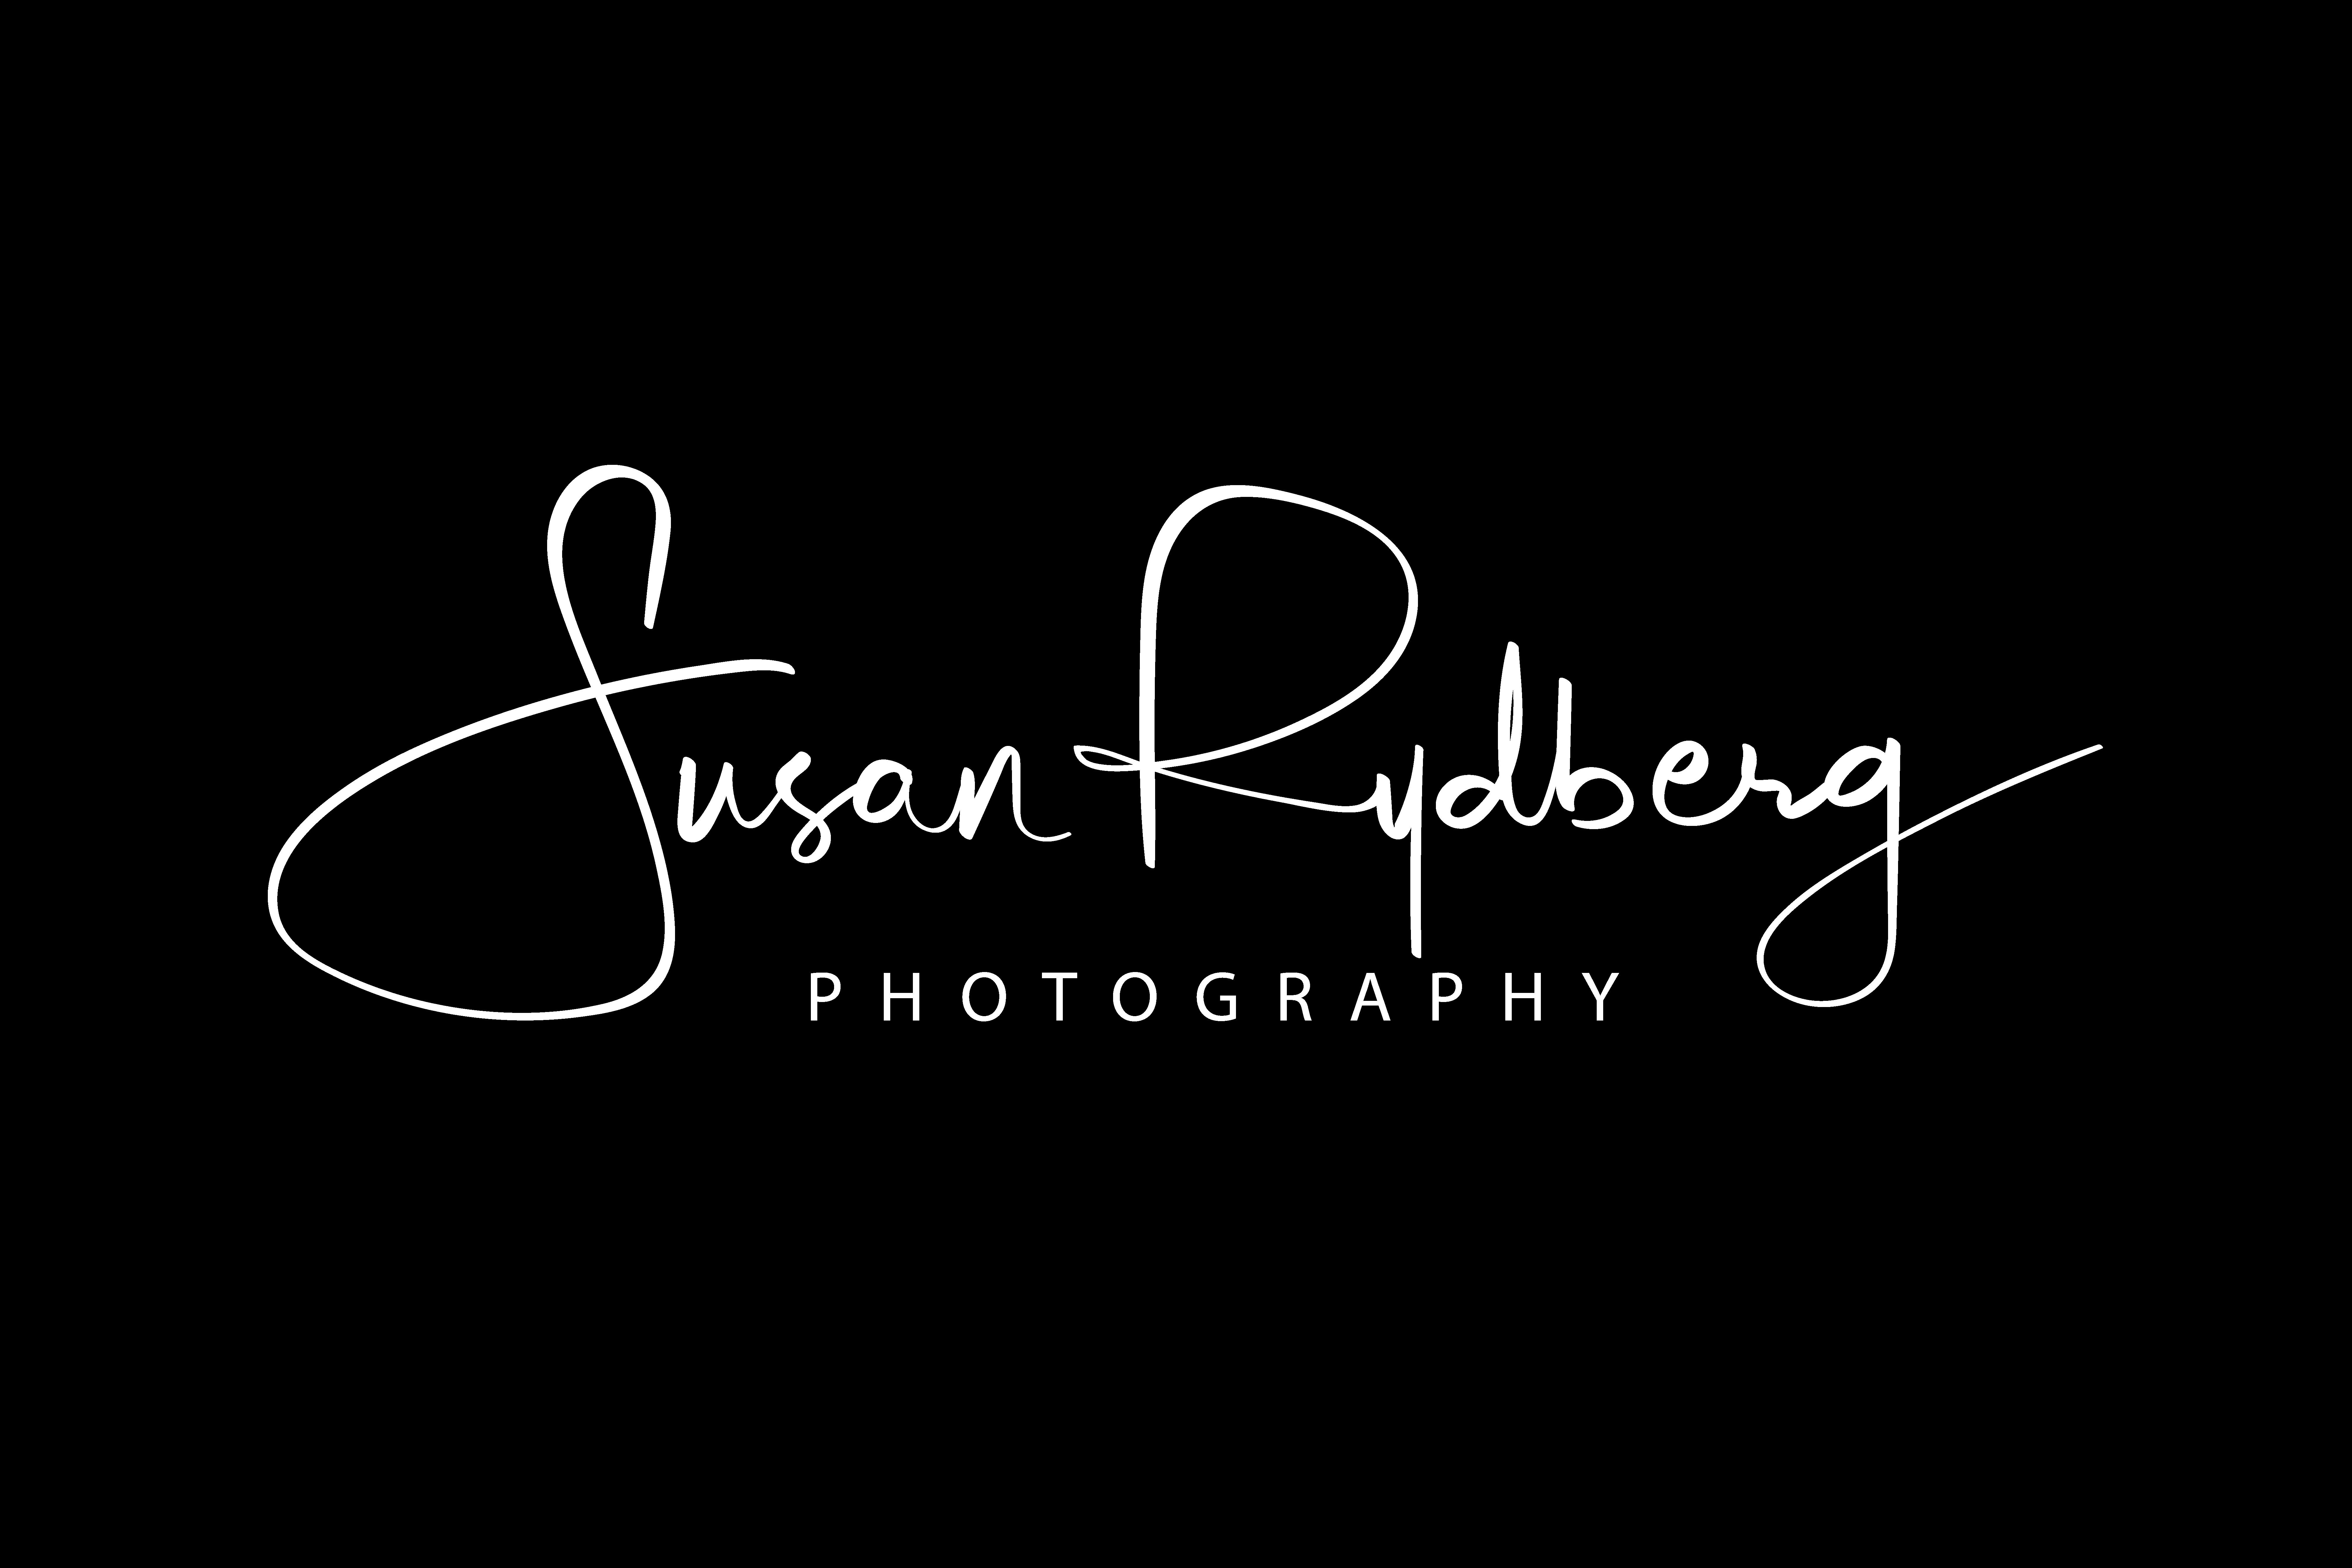 Susan Rydberg